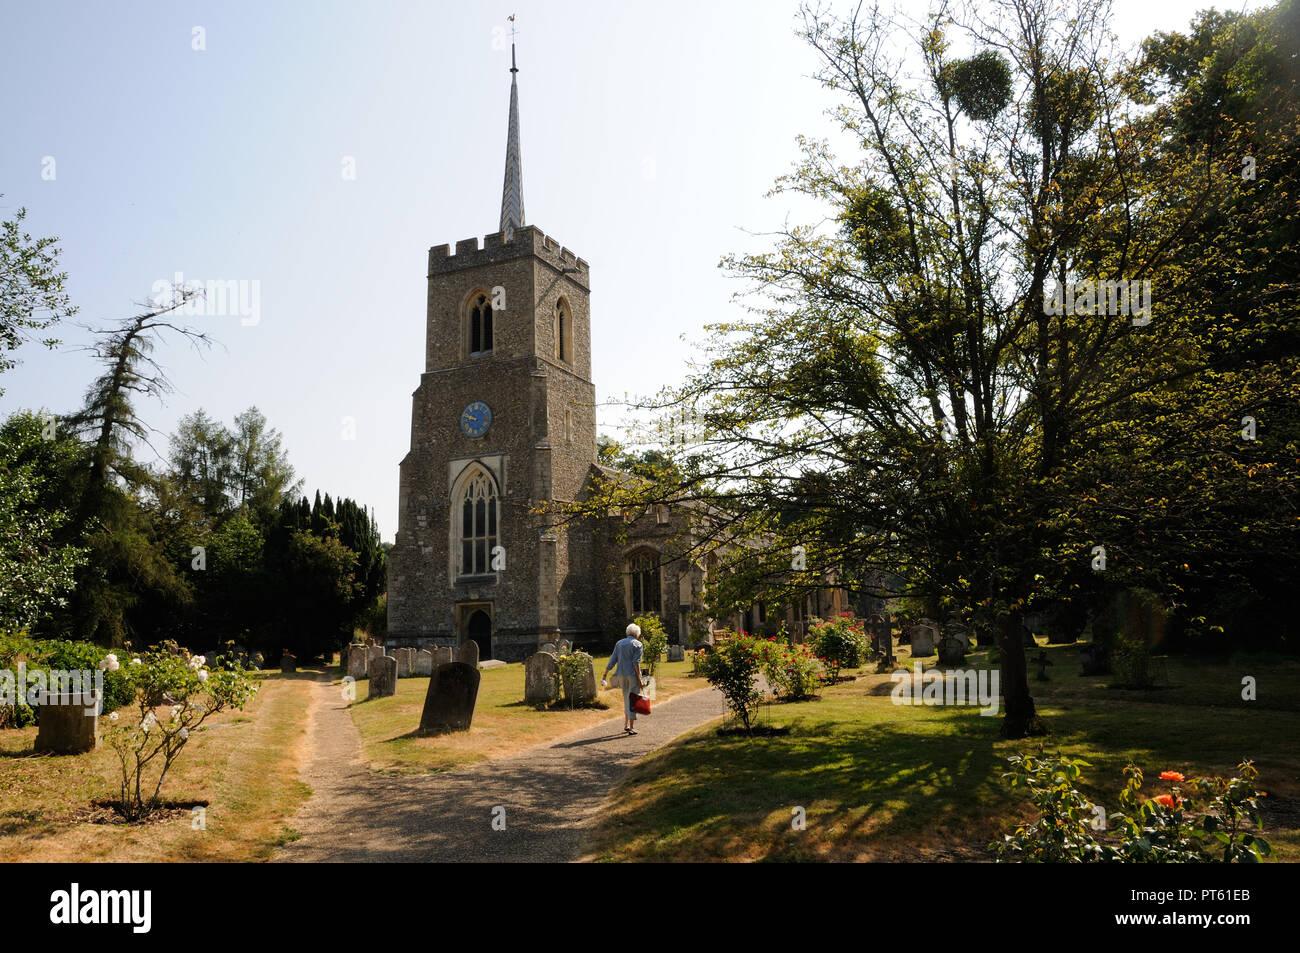 Hertfordshire dating